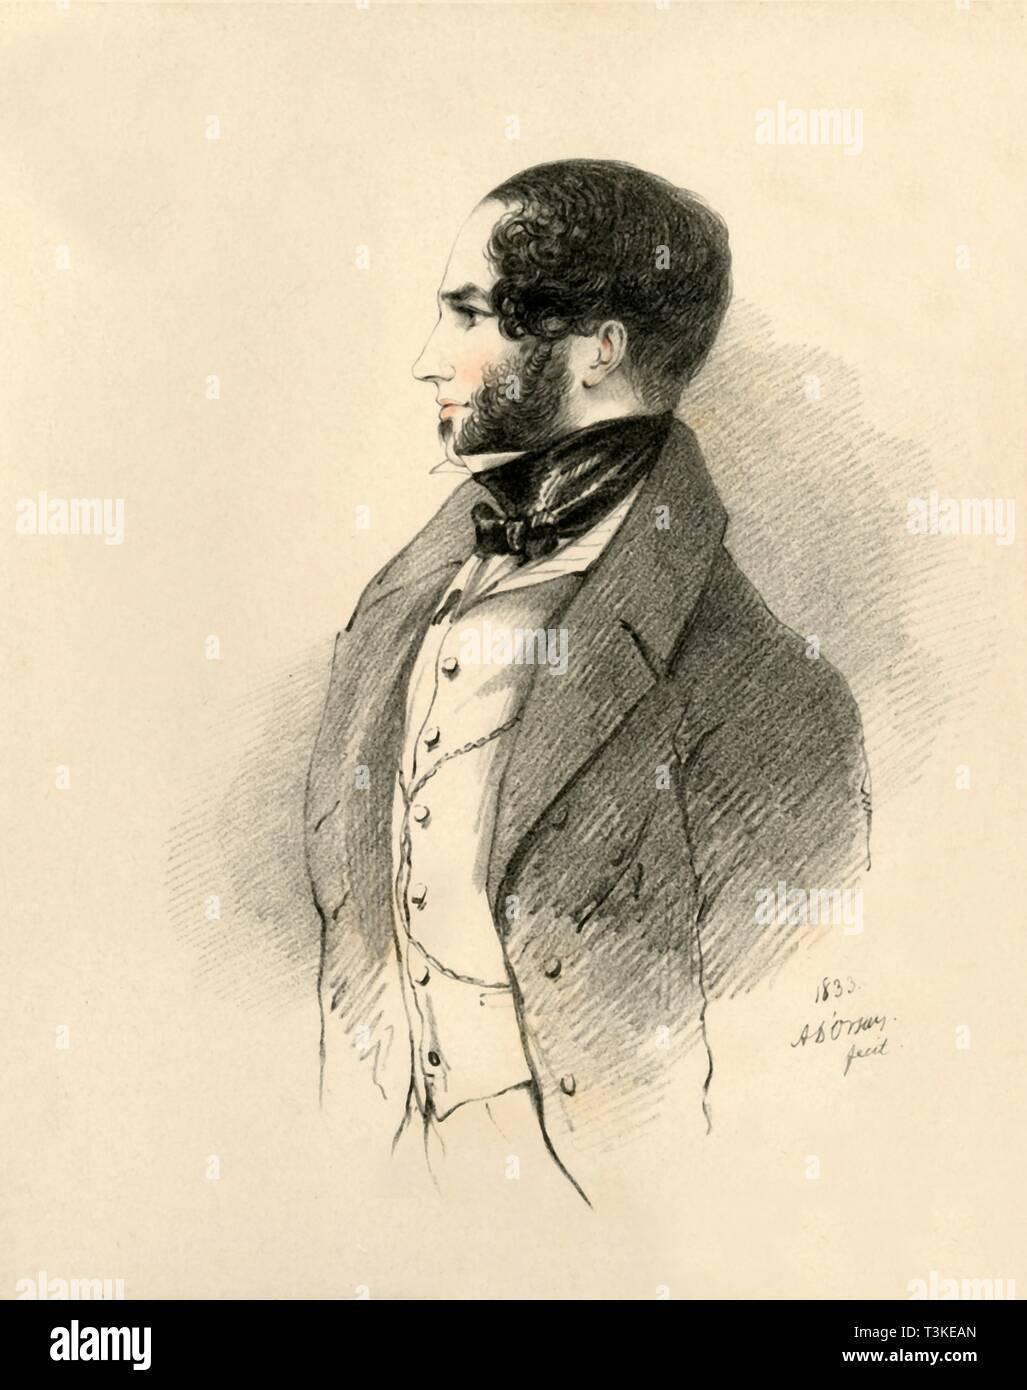 'The Marquis of Conyngham', 1833. Creator: Richard James Lane. - Stock Image